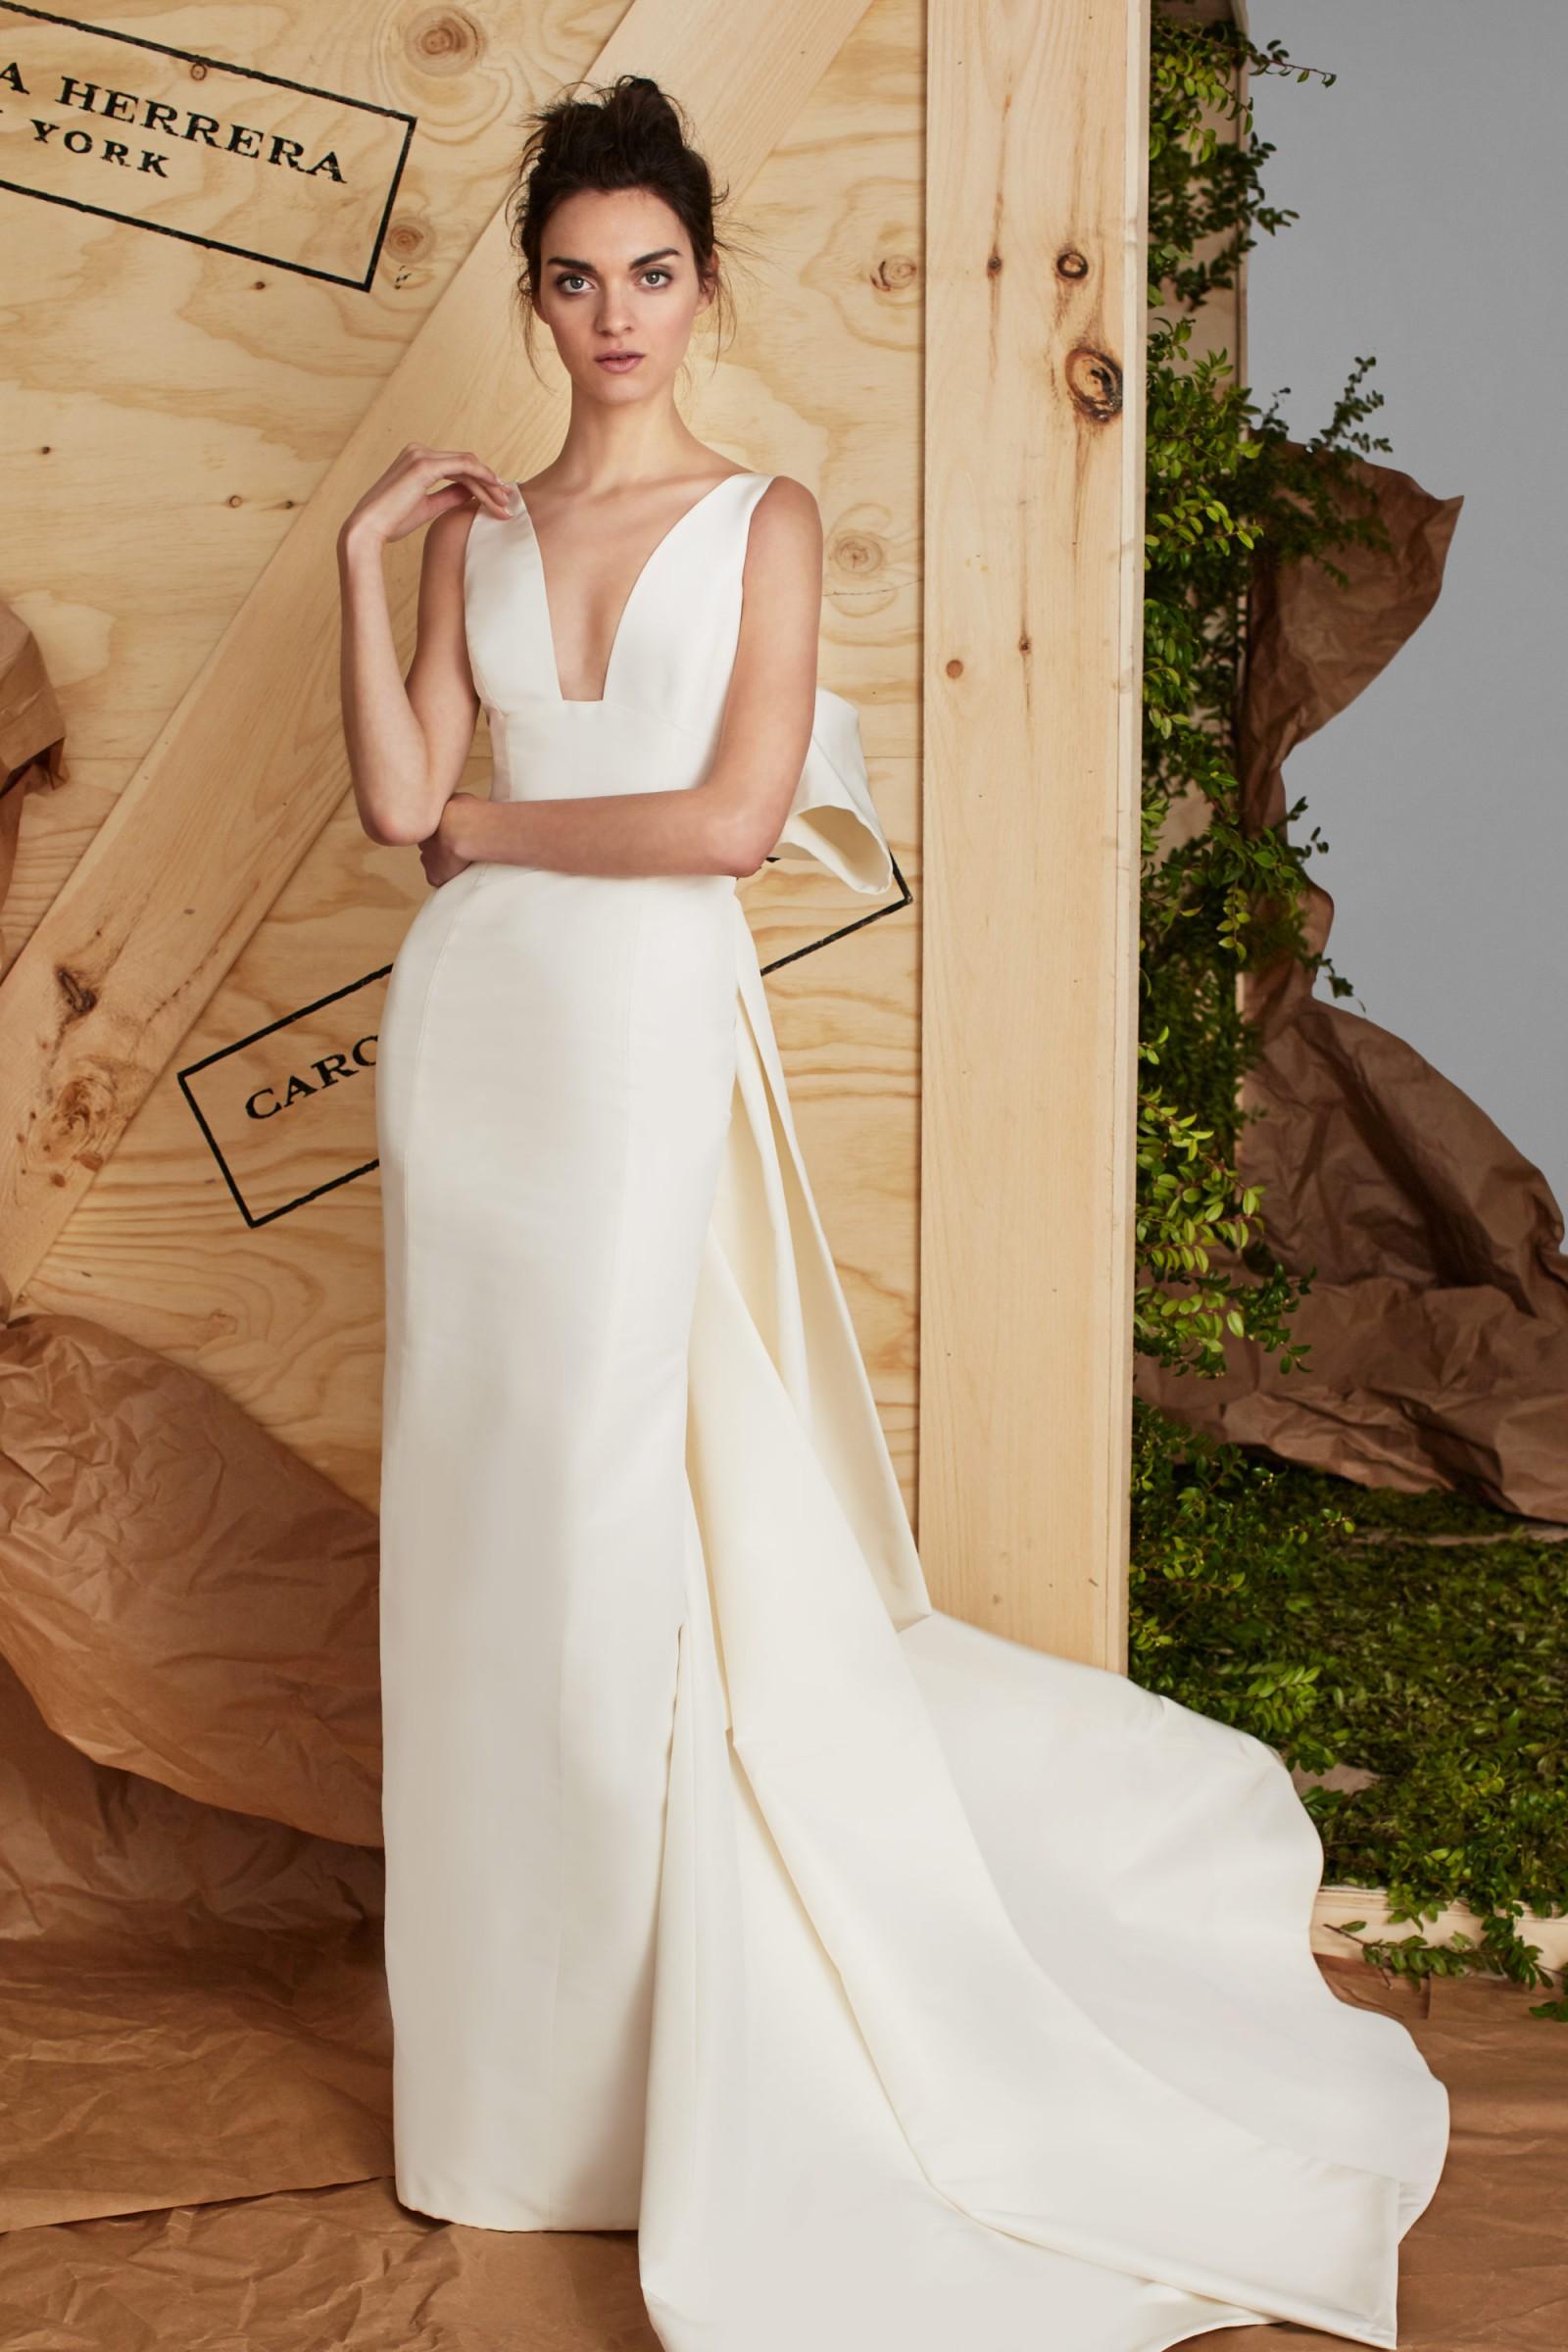 Carolina Herrera Wedding Dress.Carolina Herrera Aubrey Wedding Dress On Sale 57 Off